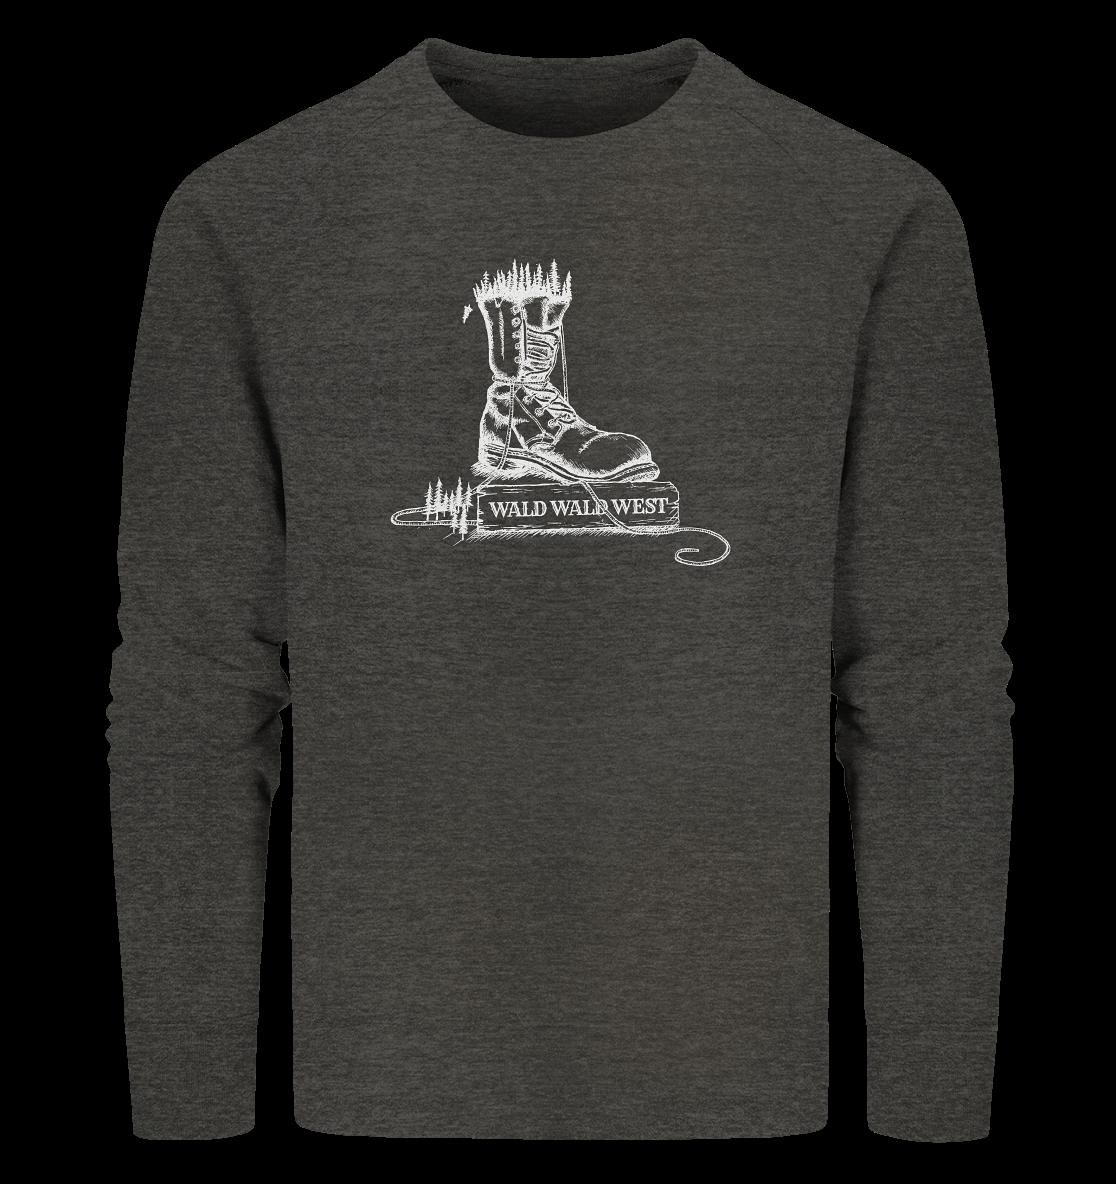 front-organic-sweatshirt-252625-1116x.png